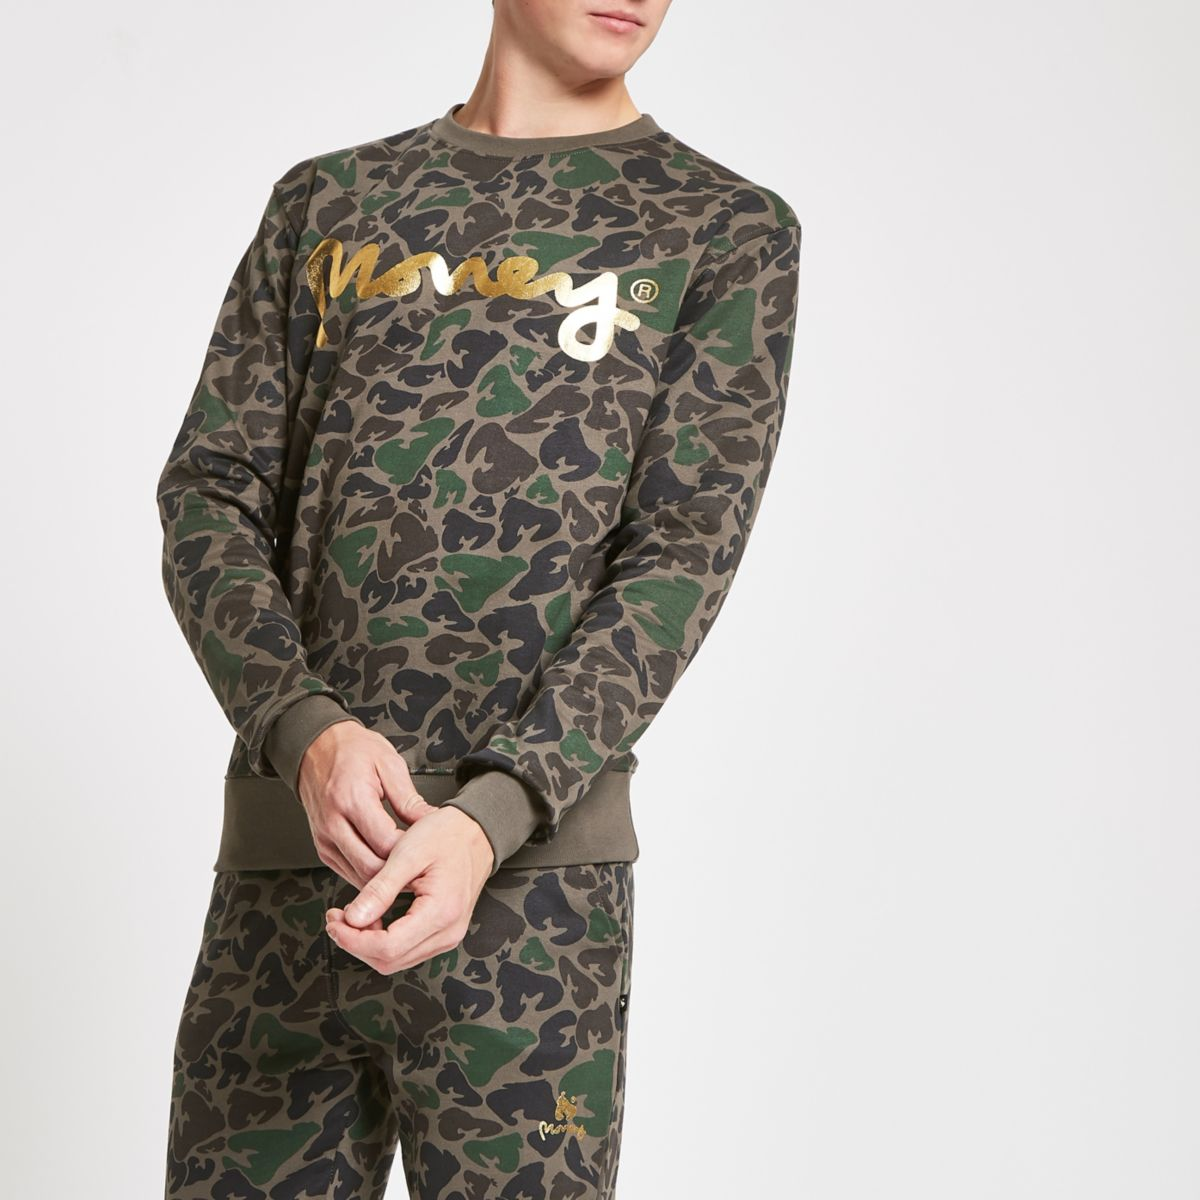 Money Clothing brown camo sweatshirt